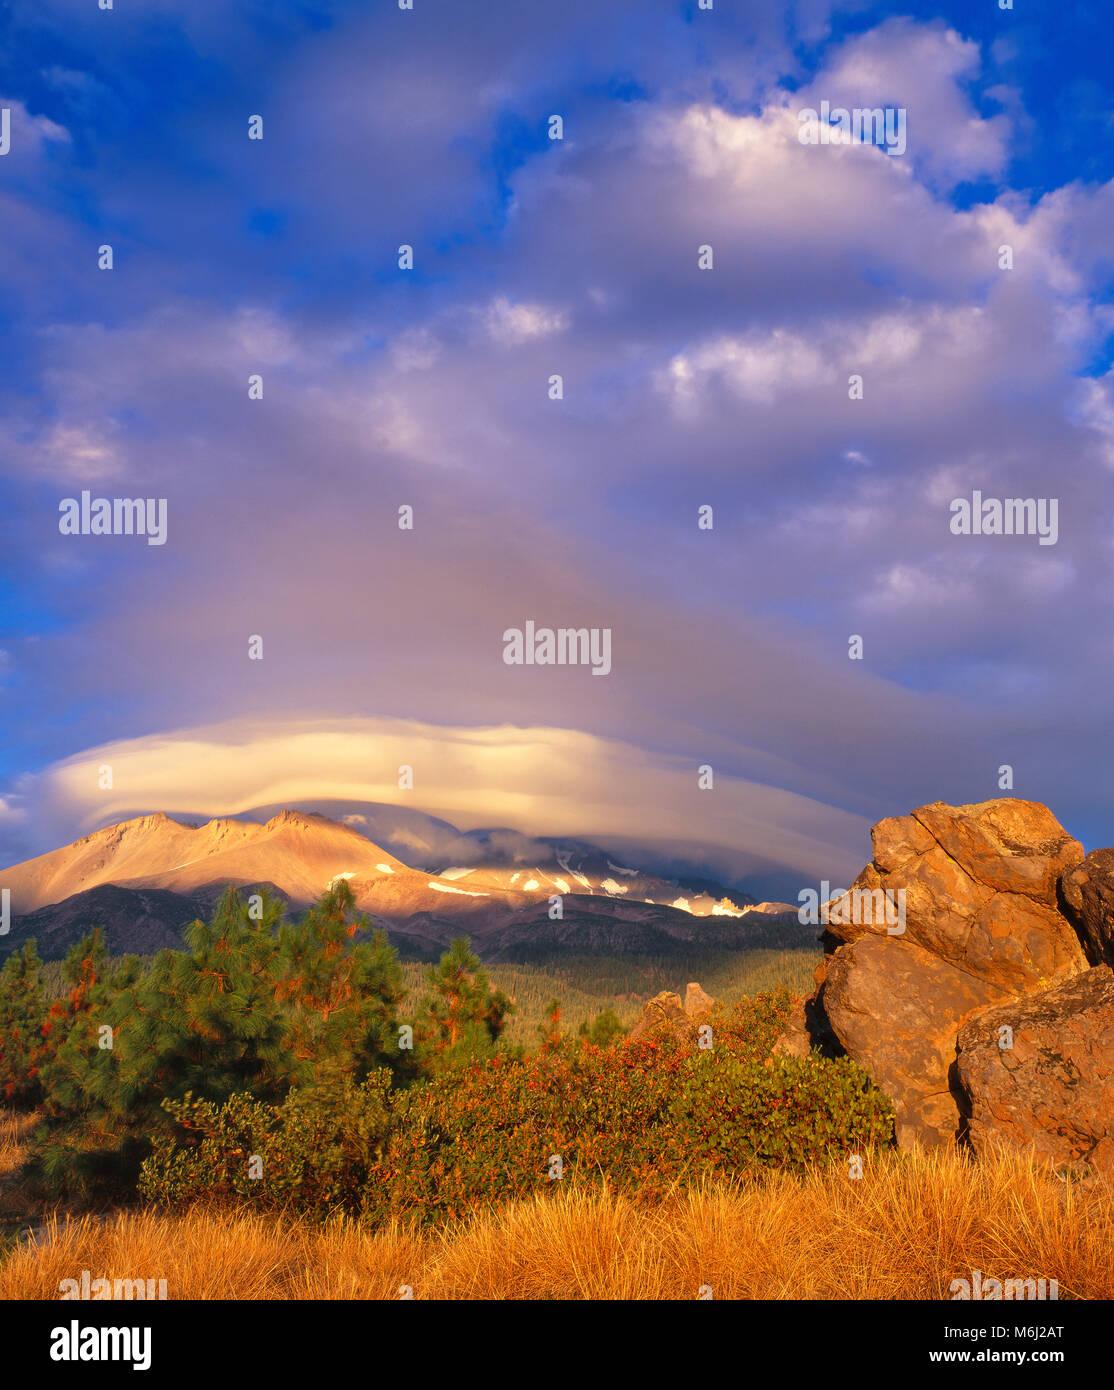 Nube lenticular, Shastina, monte Shasta, el Bosque Nacional Shasta-Trinity, California Imagen De Stock